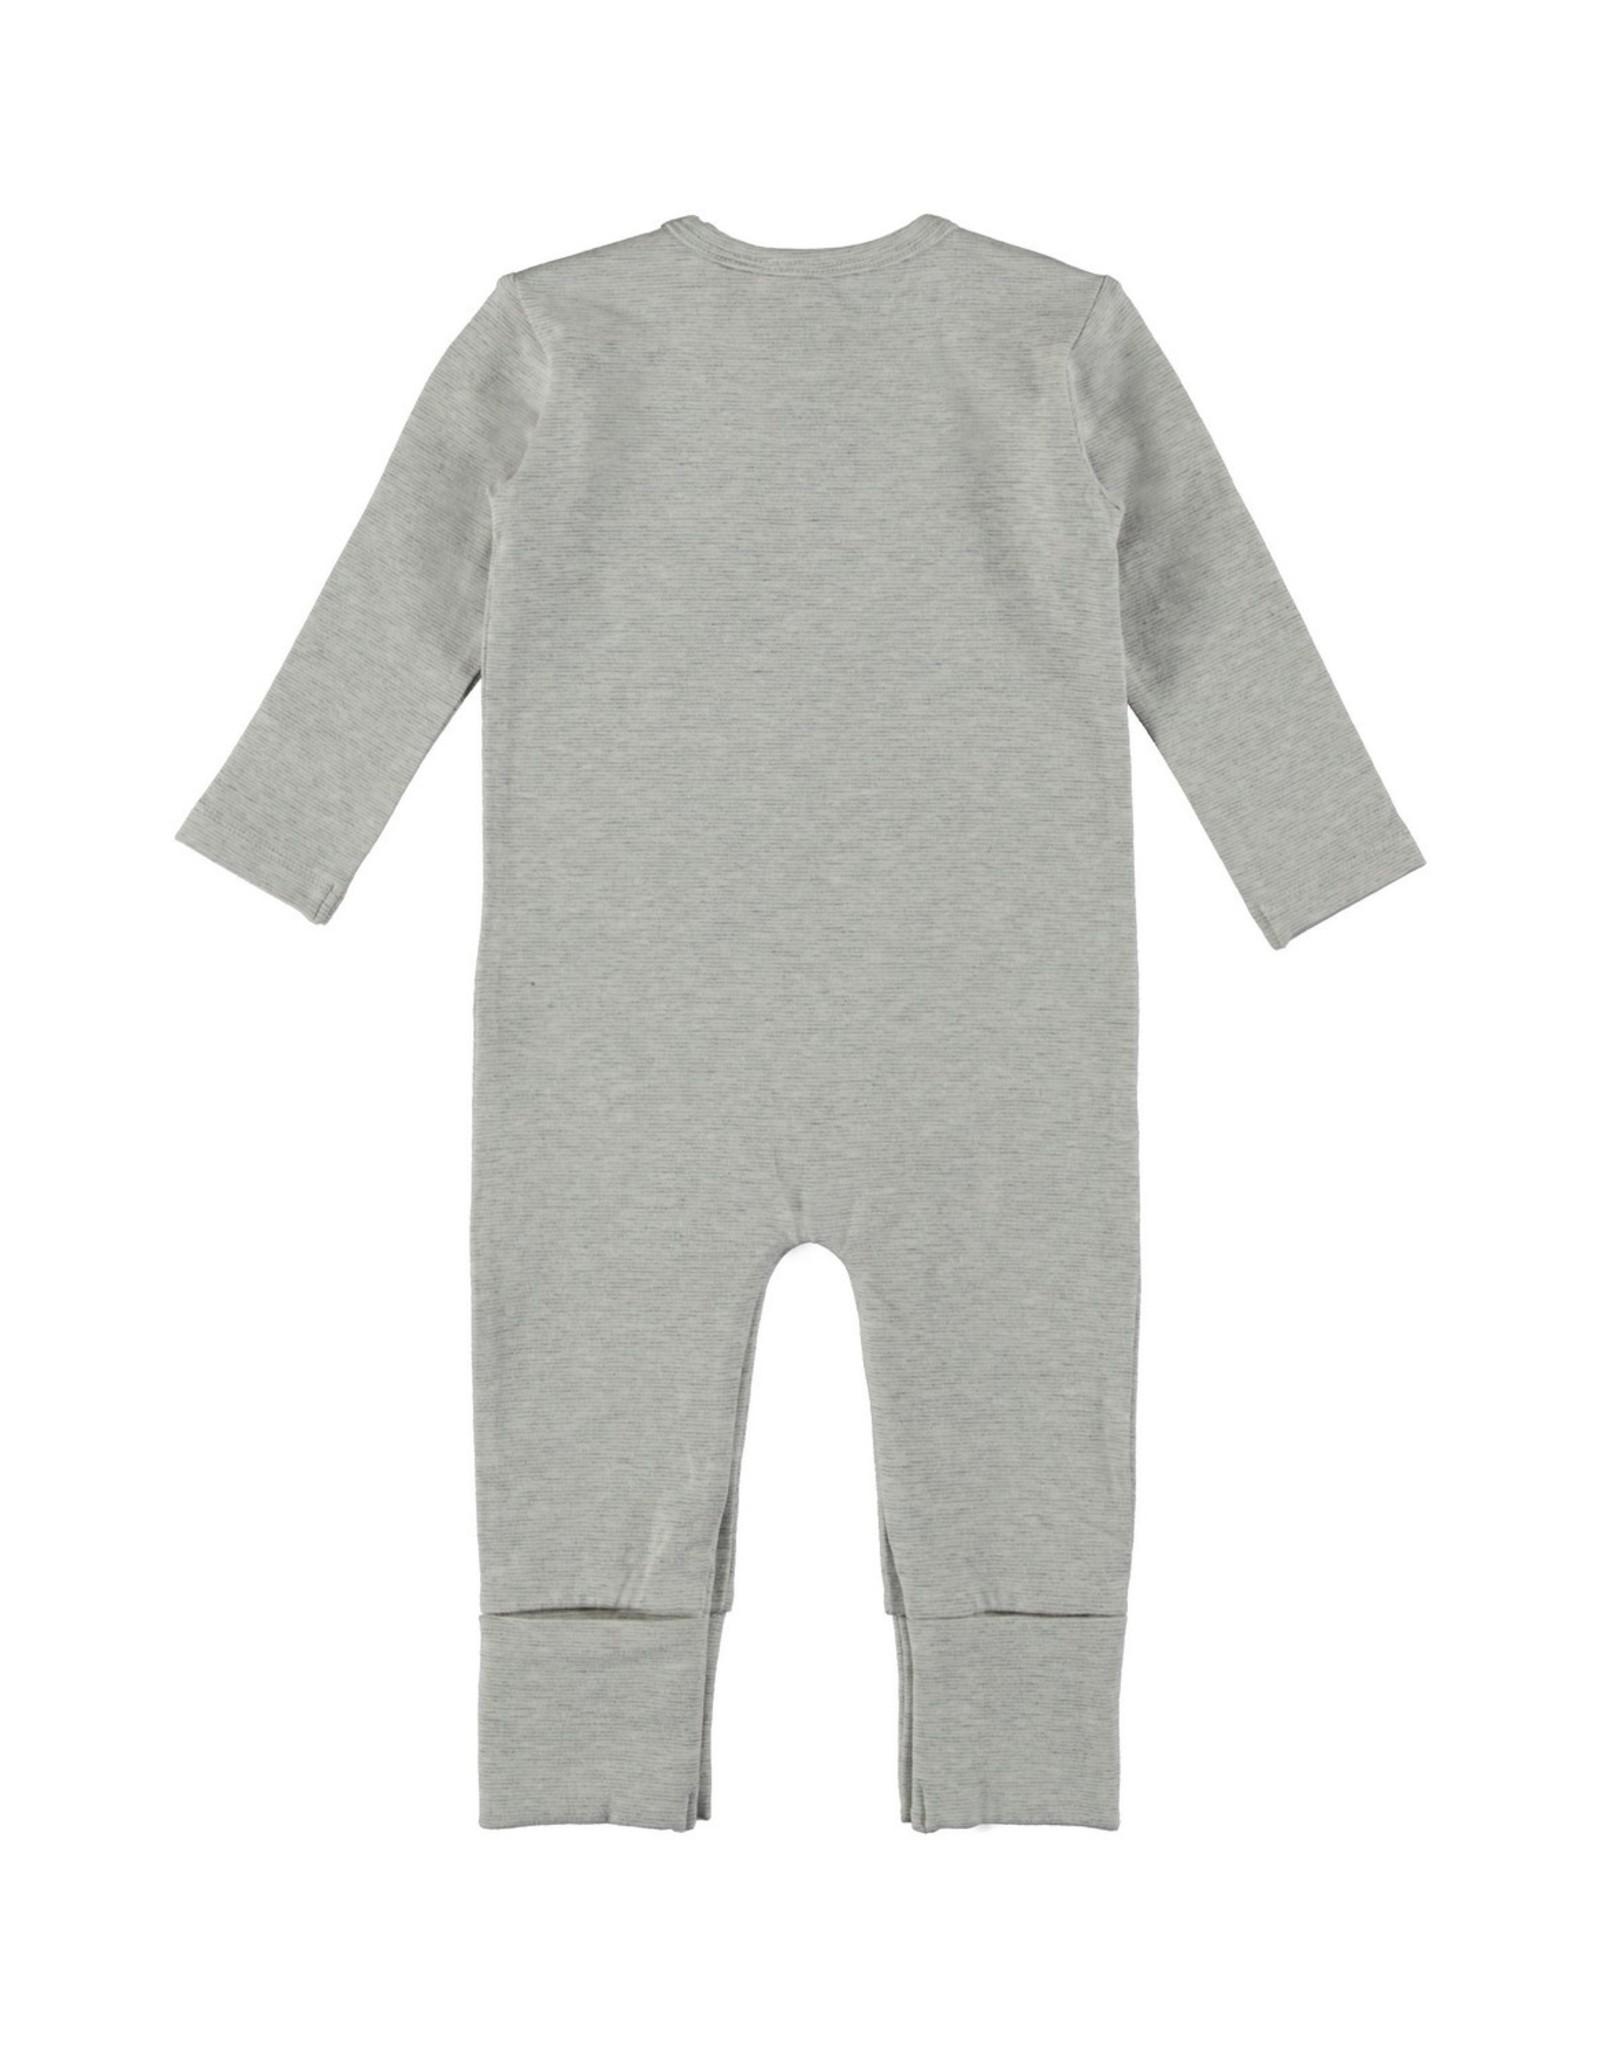 Bampidano New Born overall melange y/d stripe + chest pocket, grey melee stripe